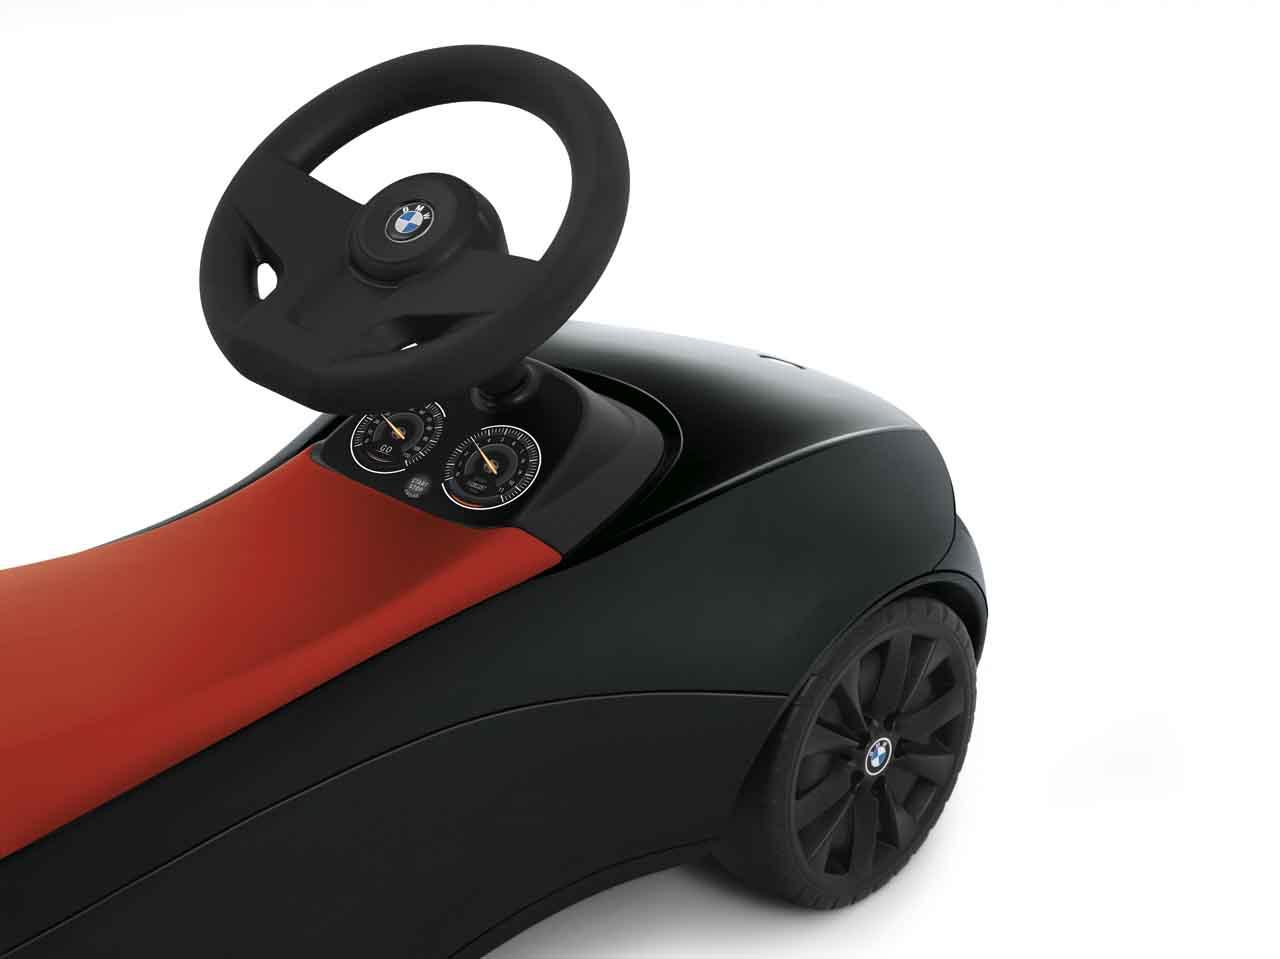 1993 gas club car parts diagram car parts diagram bmw genuine baby racer iii kids ride on push toy car black